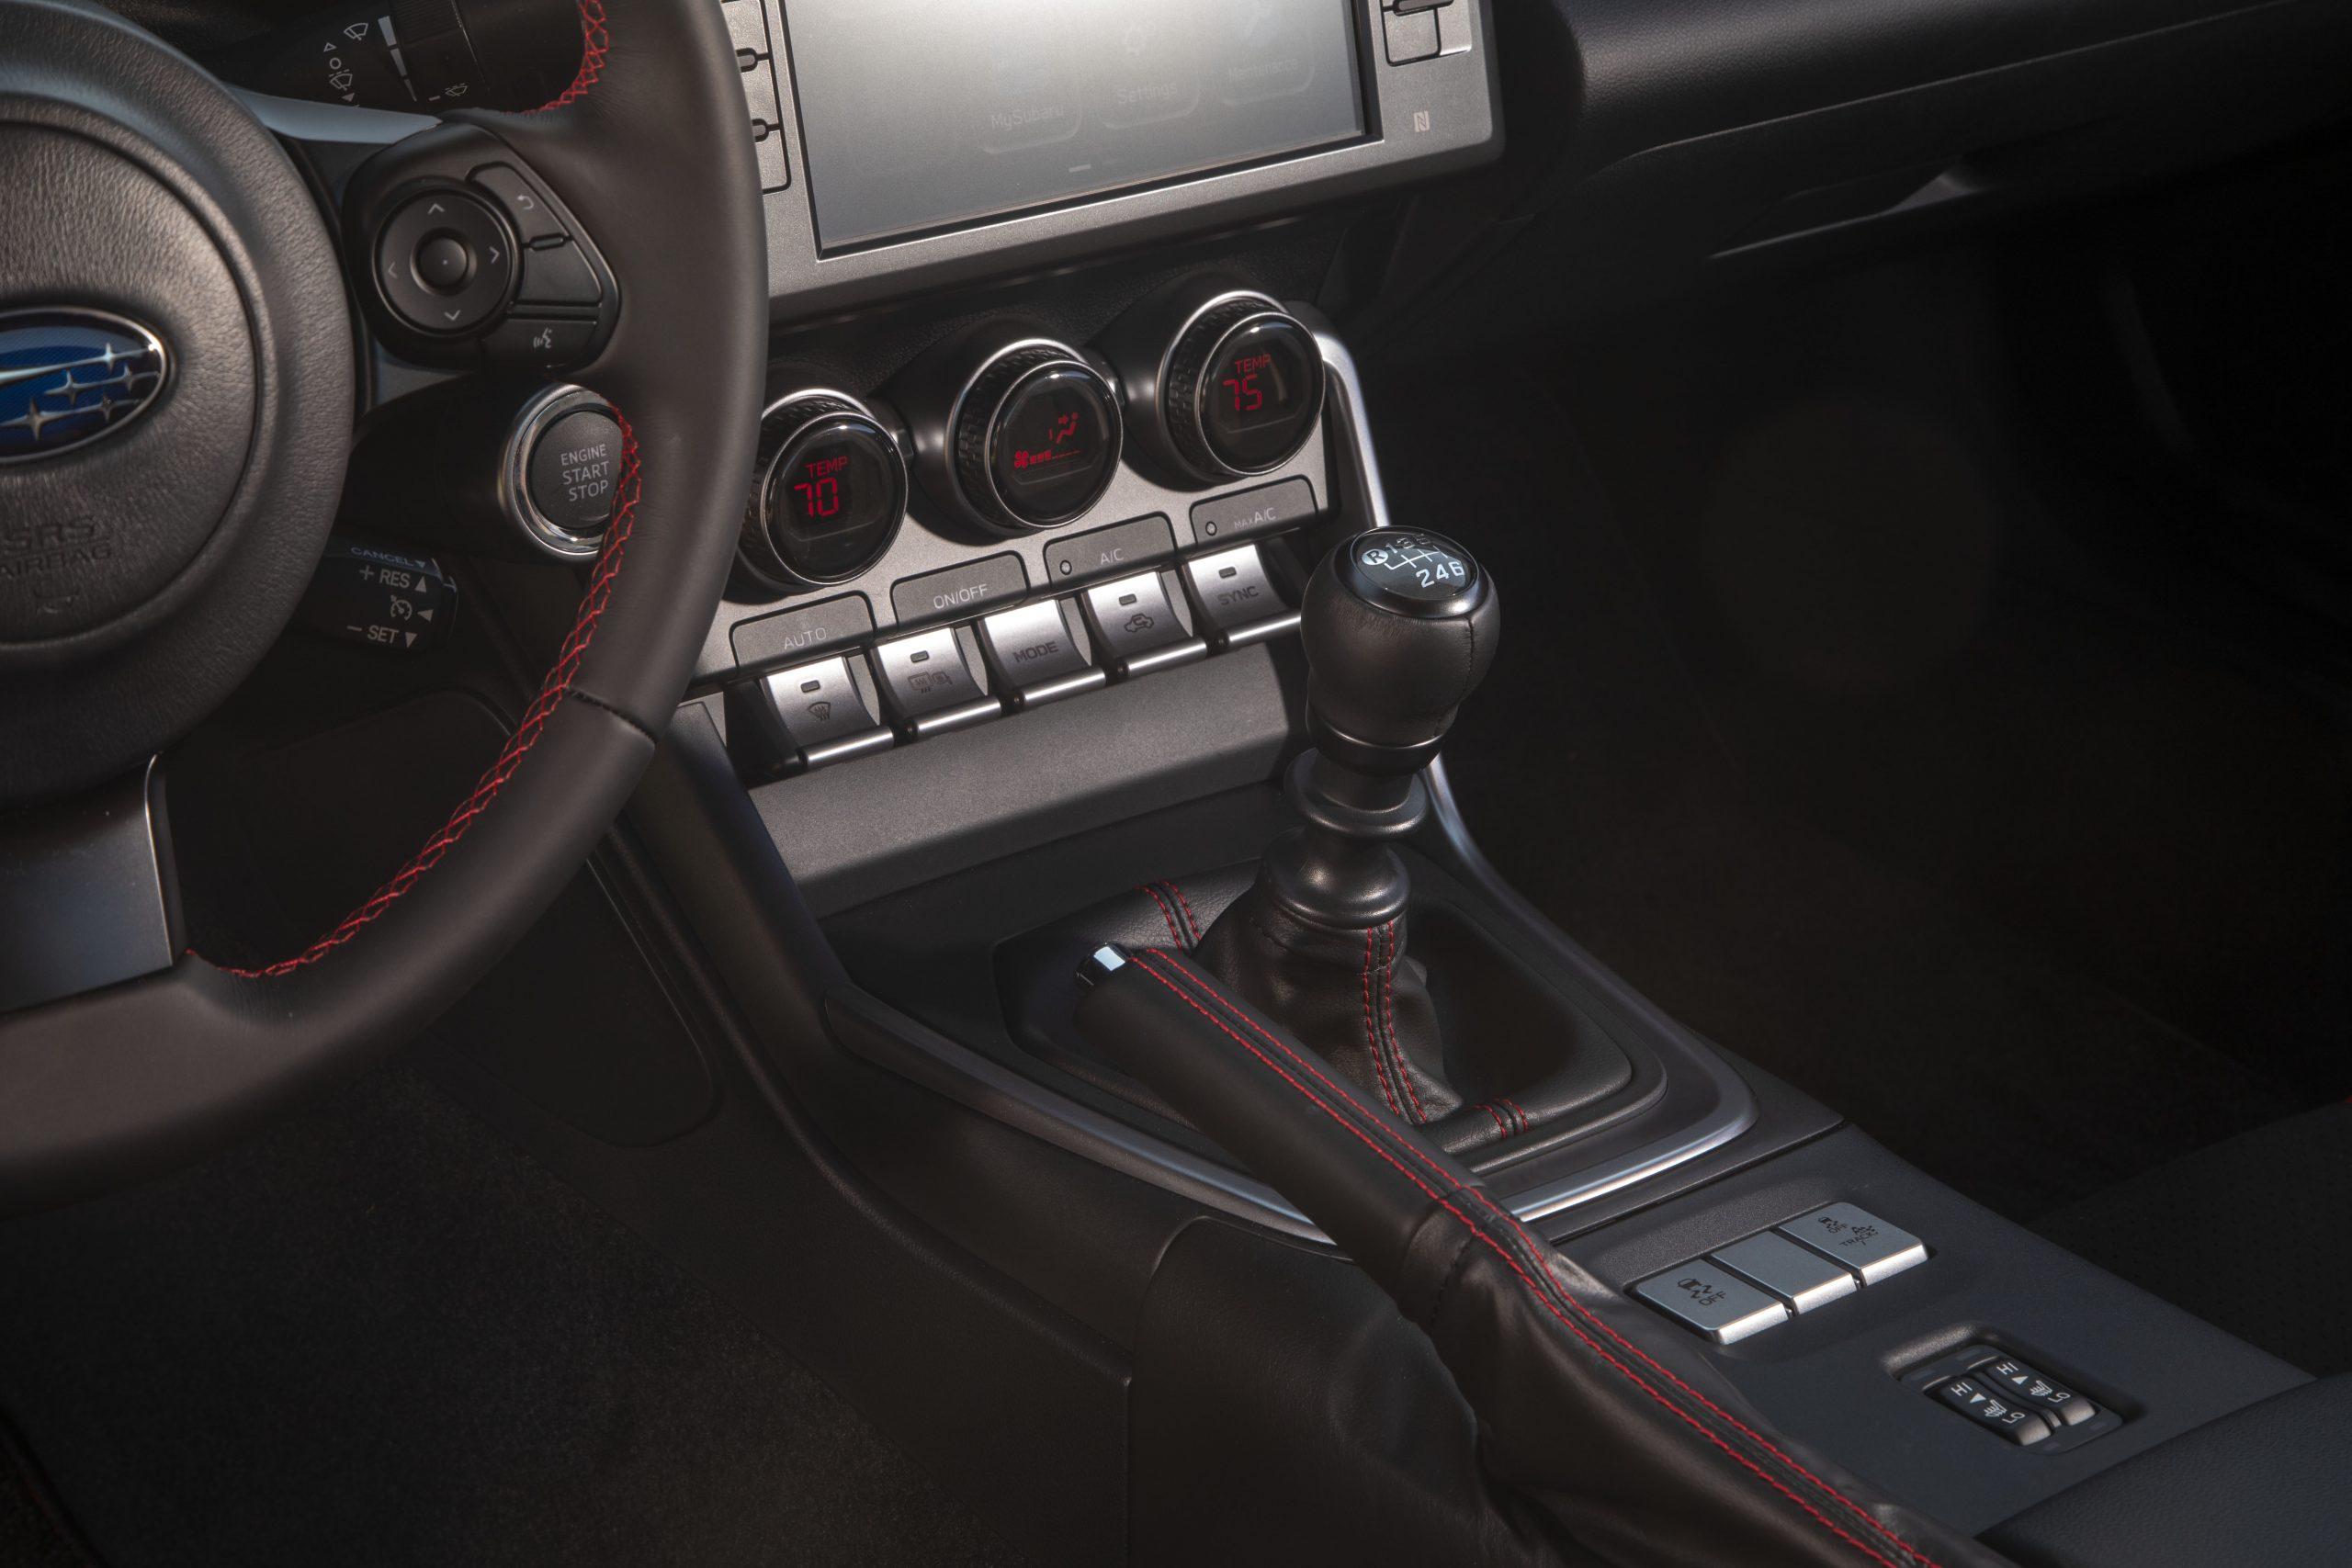 2022 Subaru BRZ interior six speed shifter